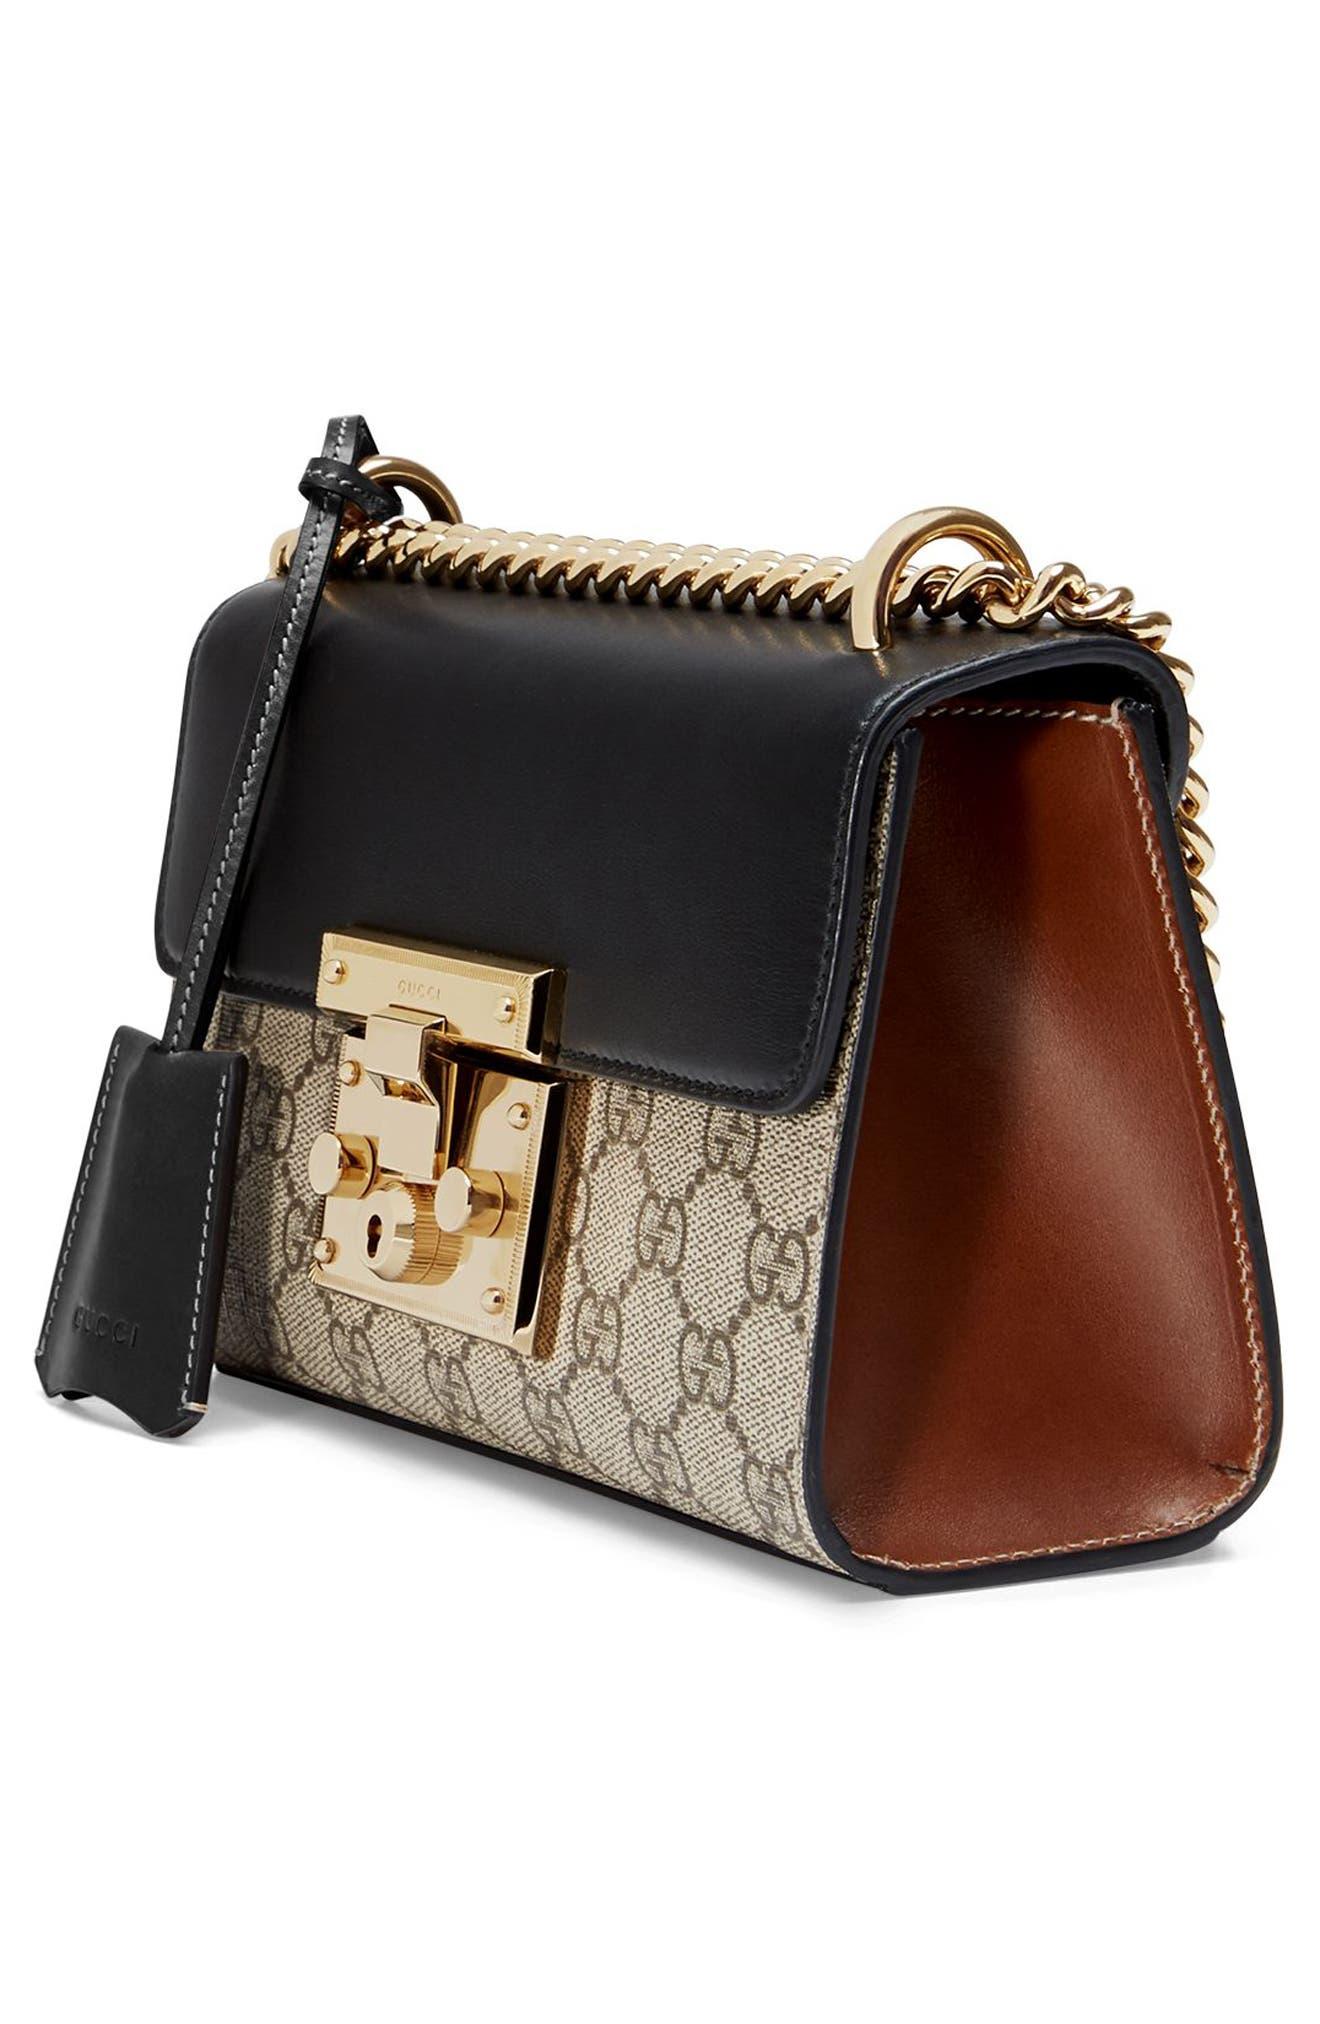 GUCCI, Small Padlock GG Supreme Canvas & Leather Shoulder Bag, Alternate thumbnail 4, color, MOON/TOSCANO